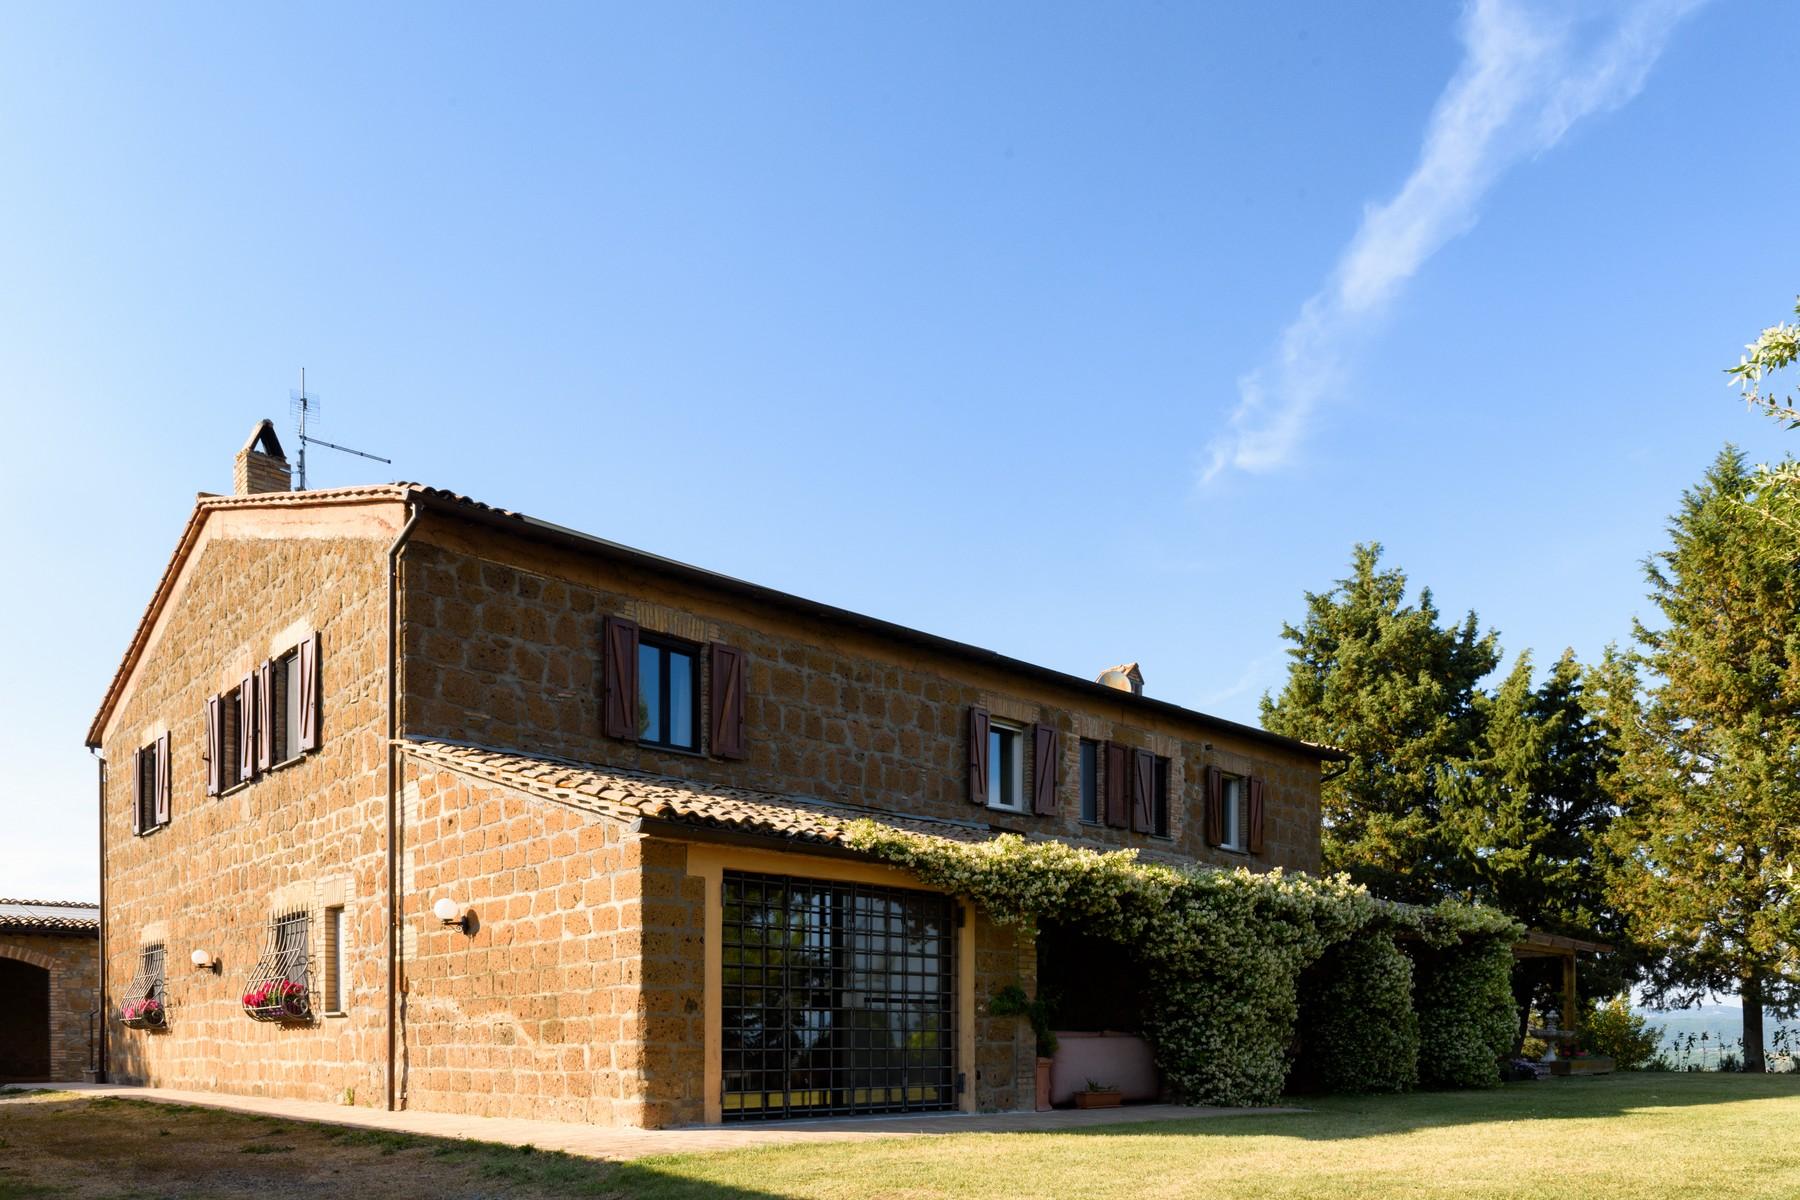 Casa indipendente in Vendita a Castel Viscardo: 5 locali, 700 mq - Foto 4